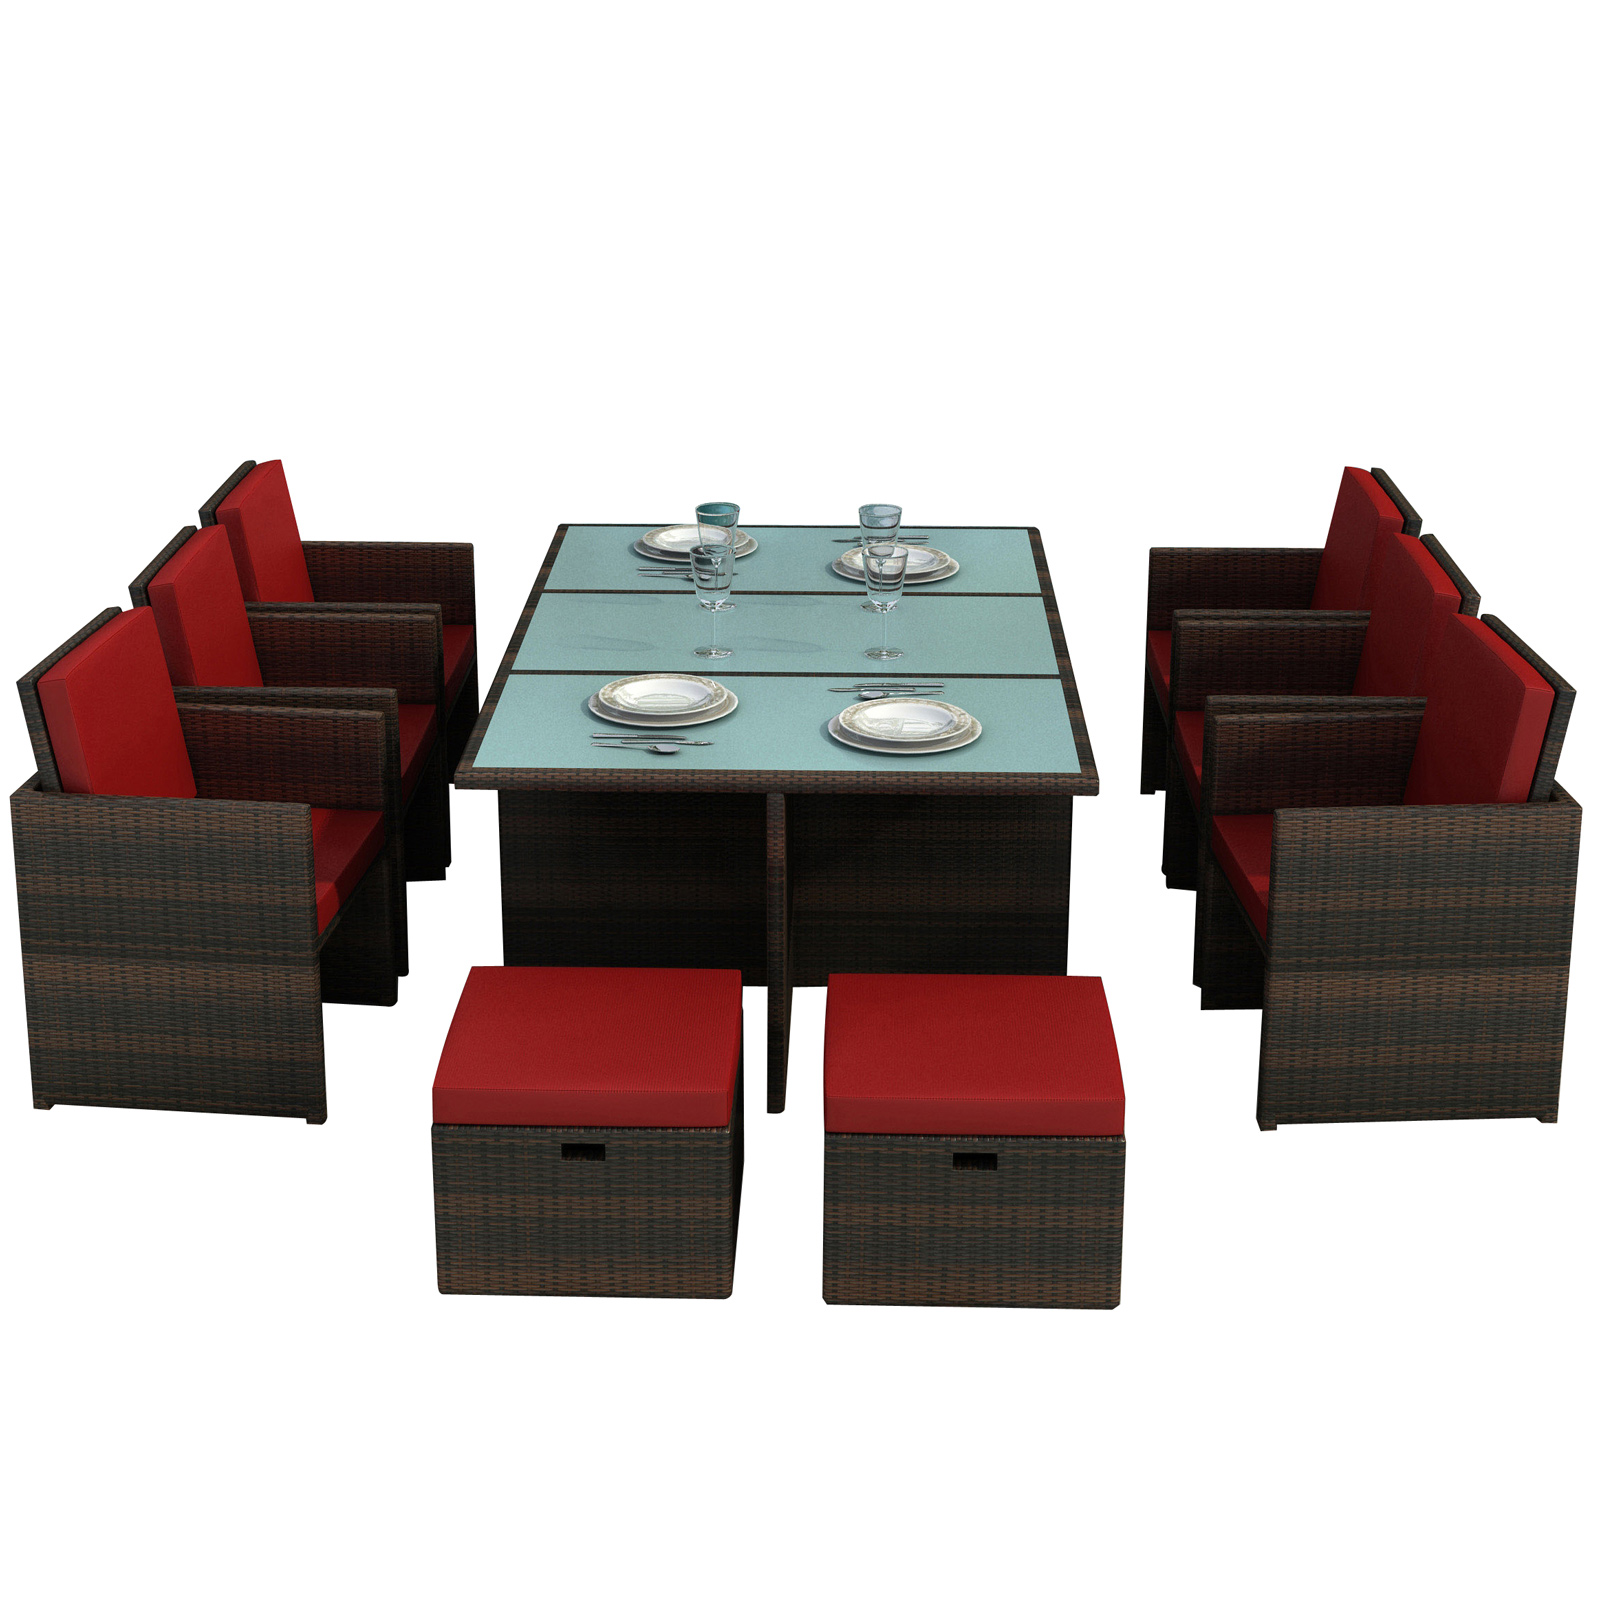 gartenm belset gartenm bel bali essgruppe rot braun 1b 2 wahl ebay. Black Bedroom Furniture Sets. Home Design Ideas